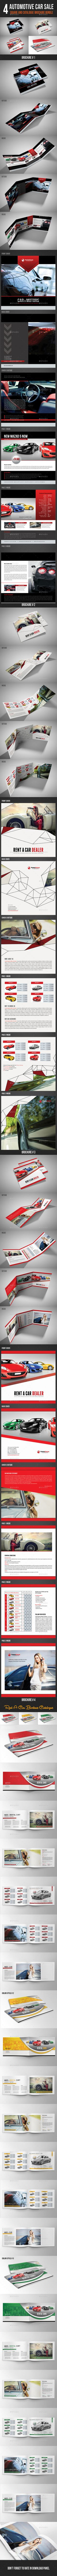 17 best car brochures images on pinterest car brochure brochure